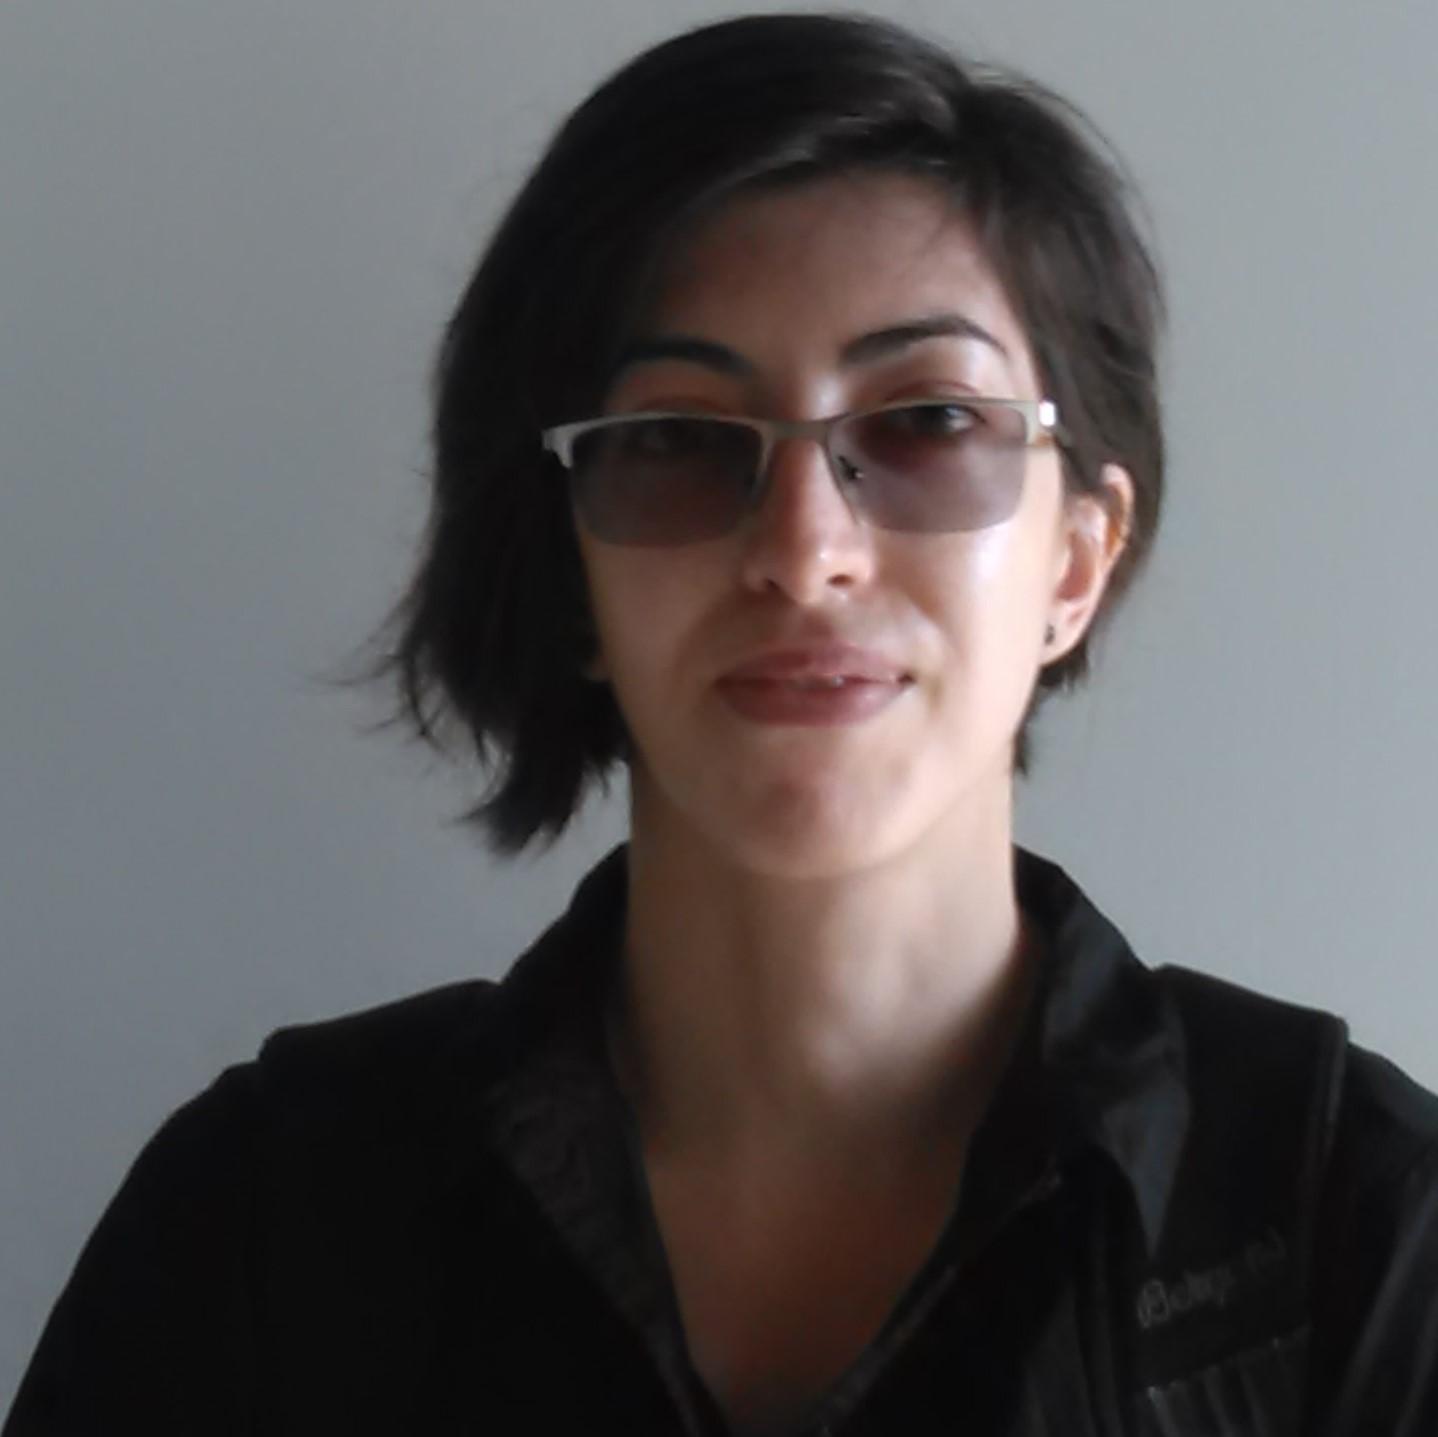 Iuliana Ene Head shot